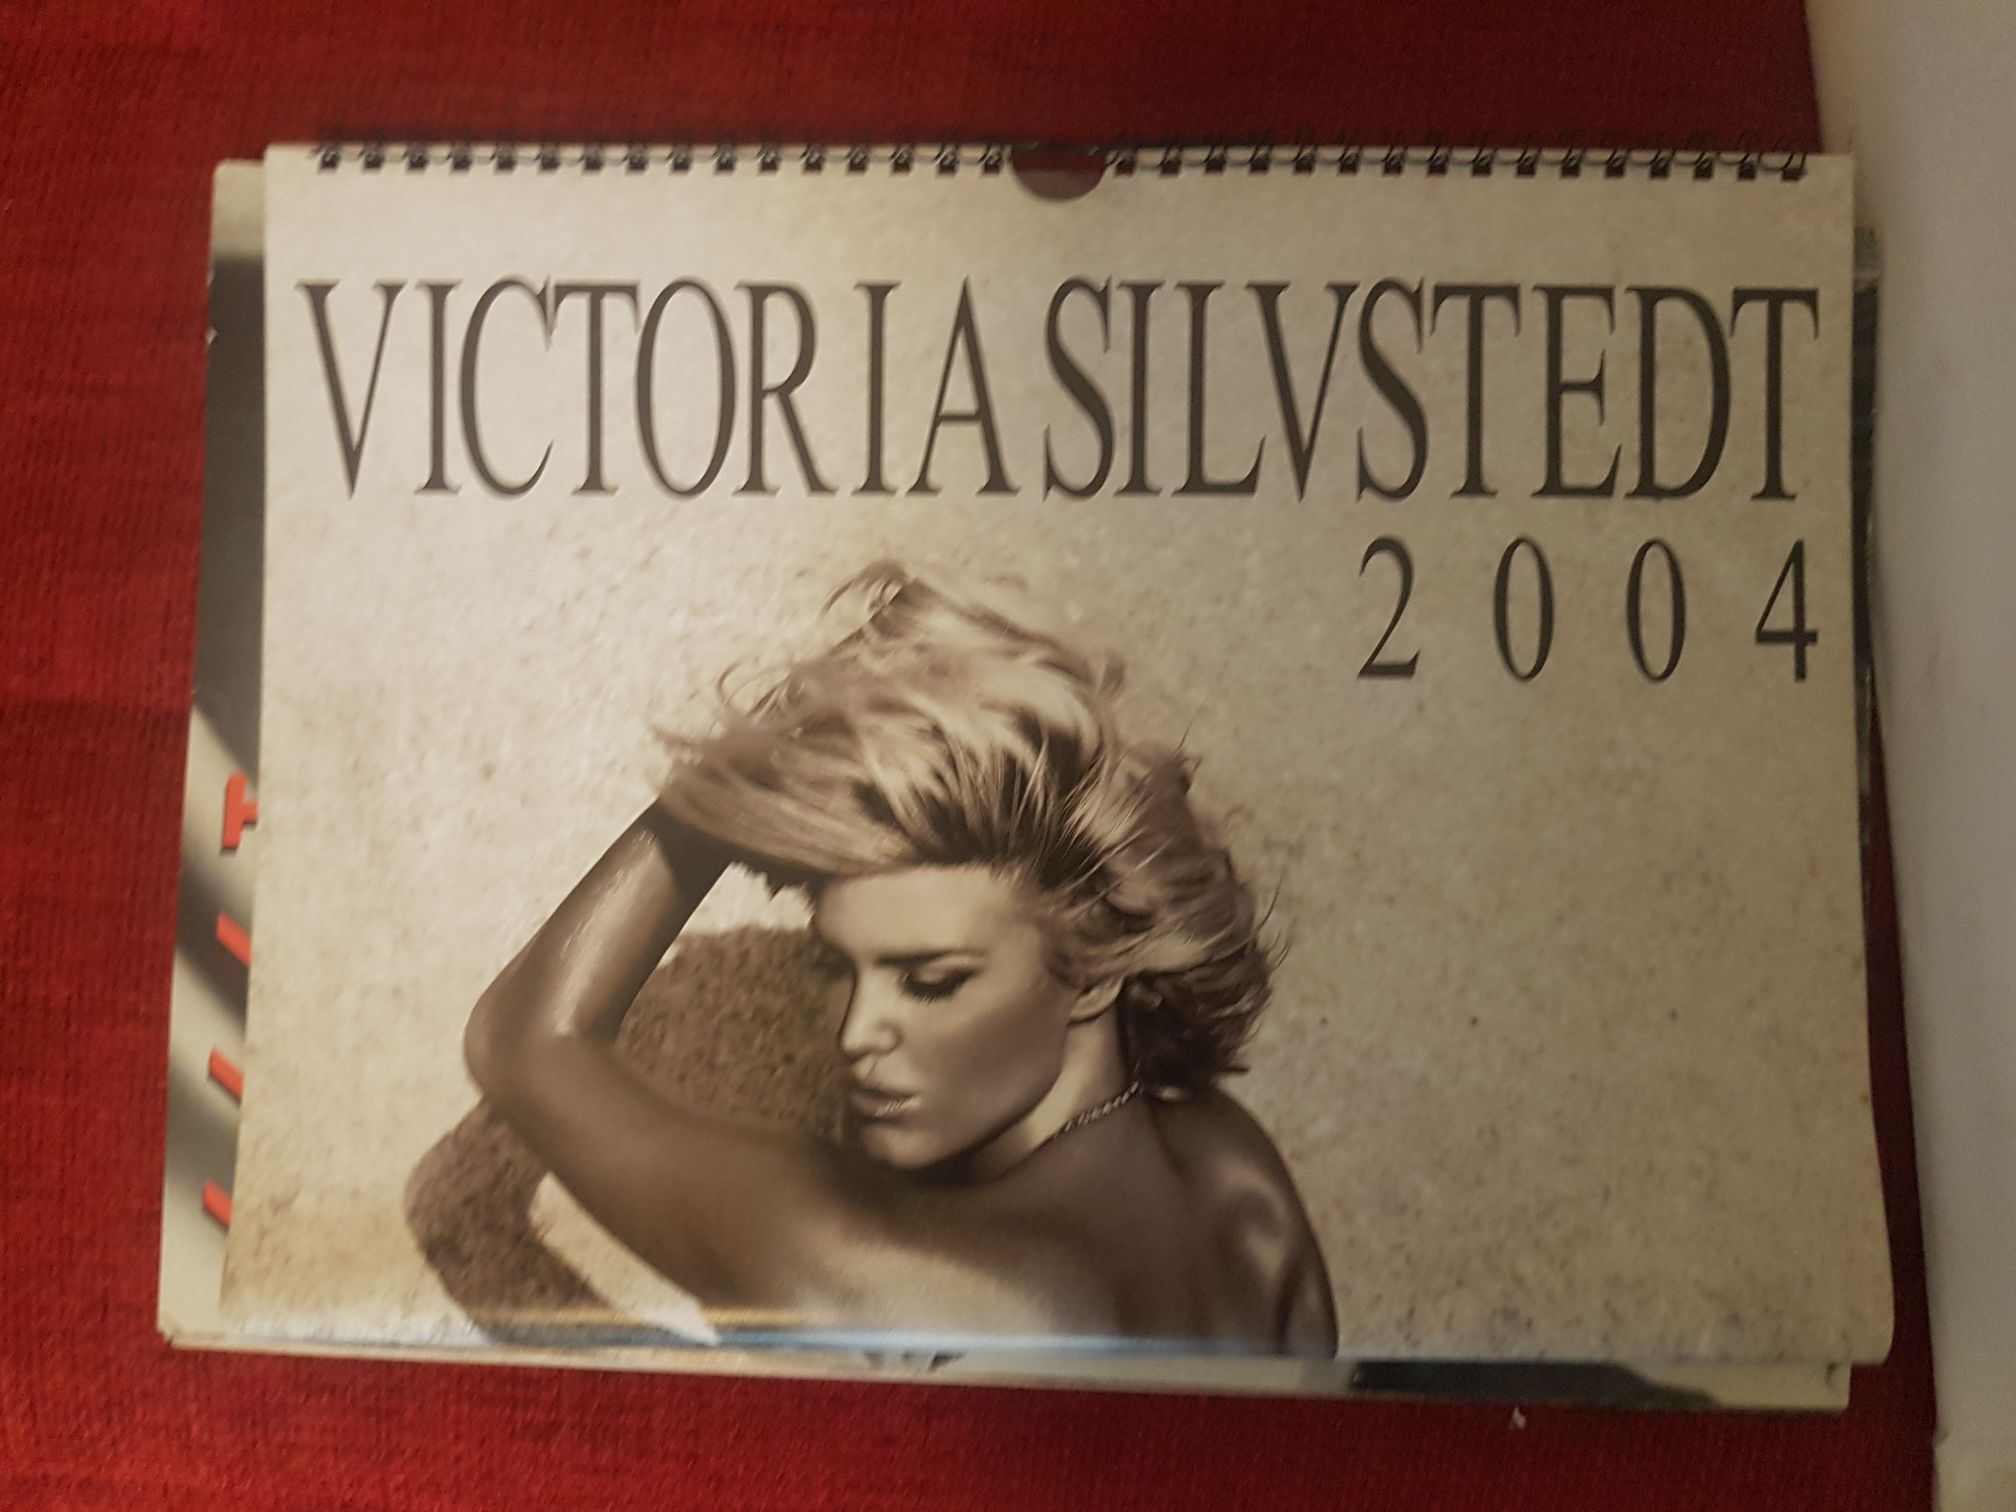 Monica Bellucci Calendario Max.Victoria Silvstedt Calendario 2004